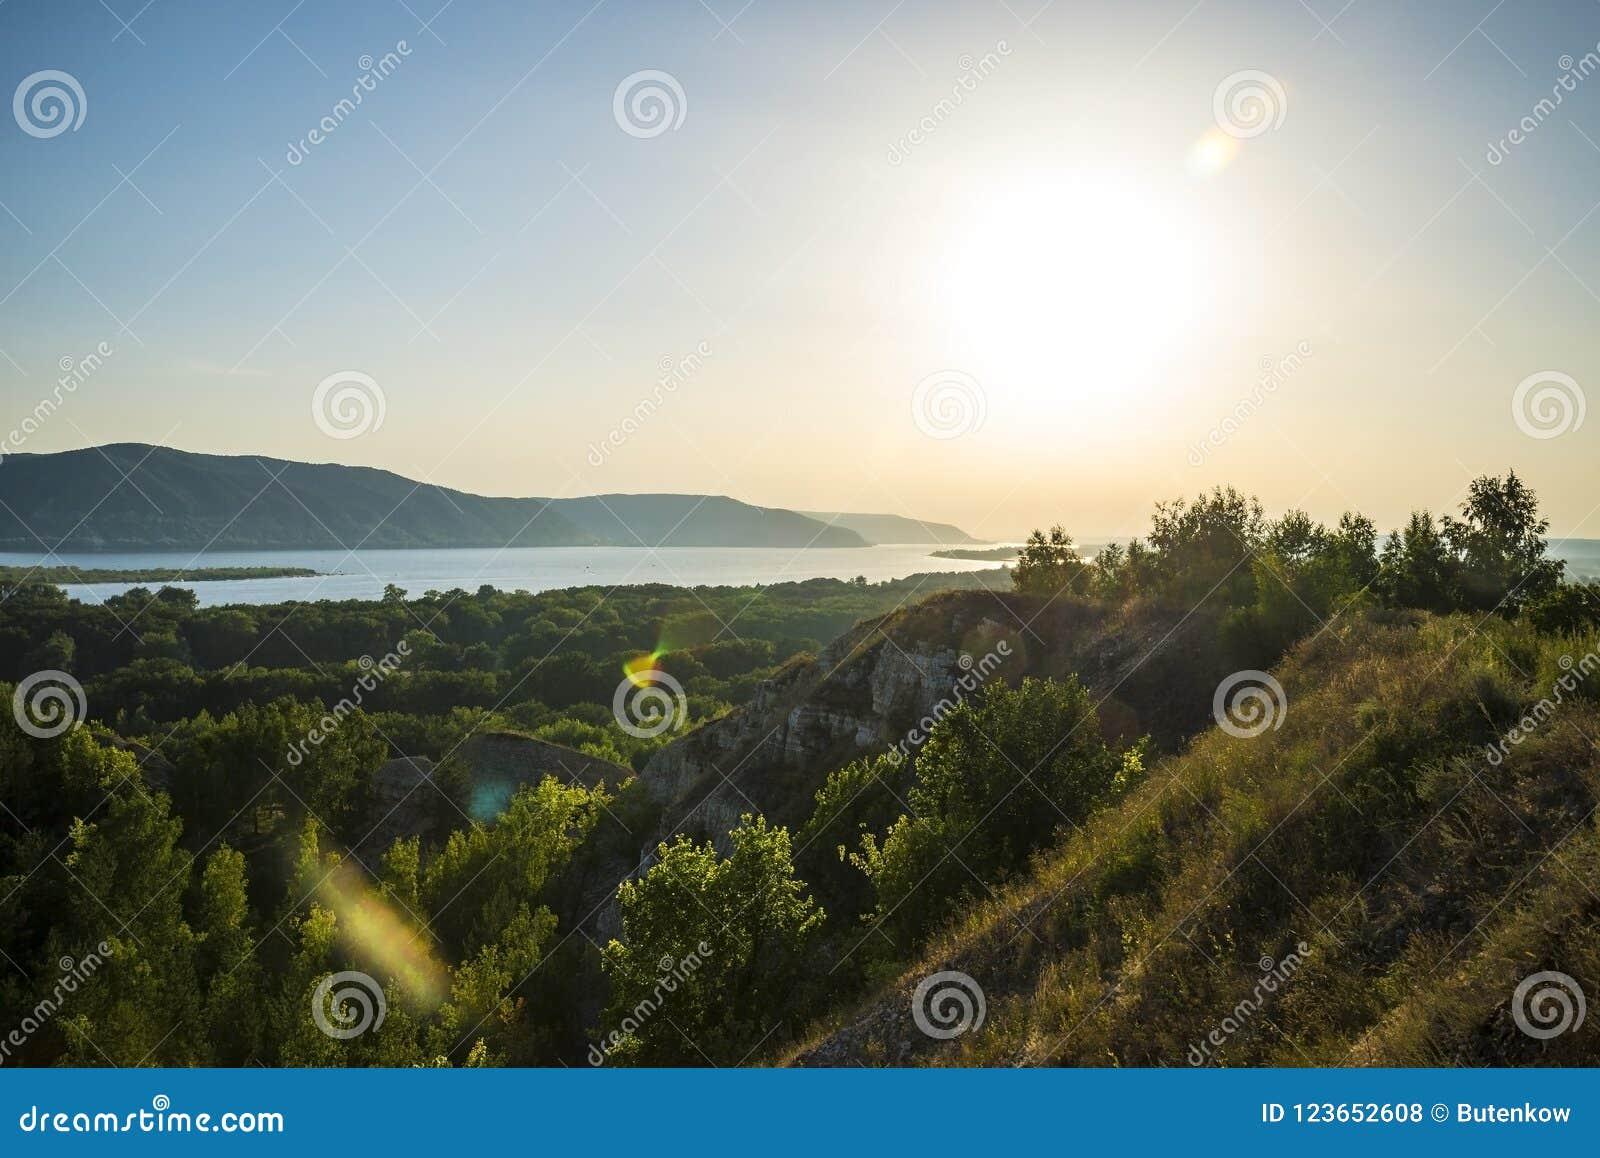 Tsarev Kurgan, Samara: description, location and interesting facts 24